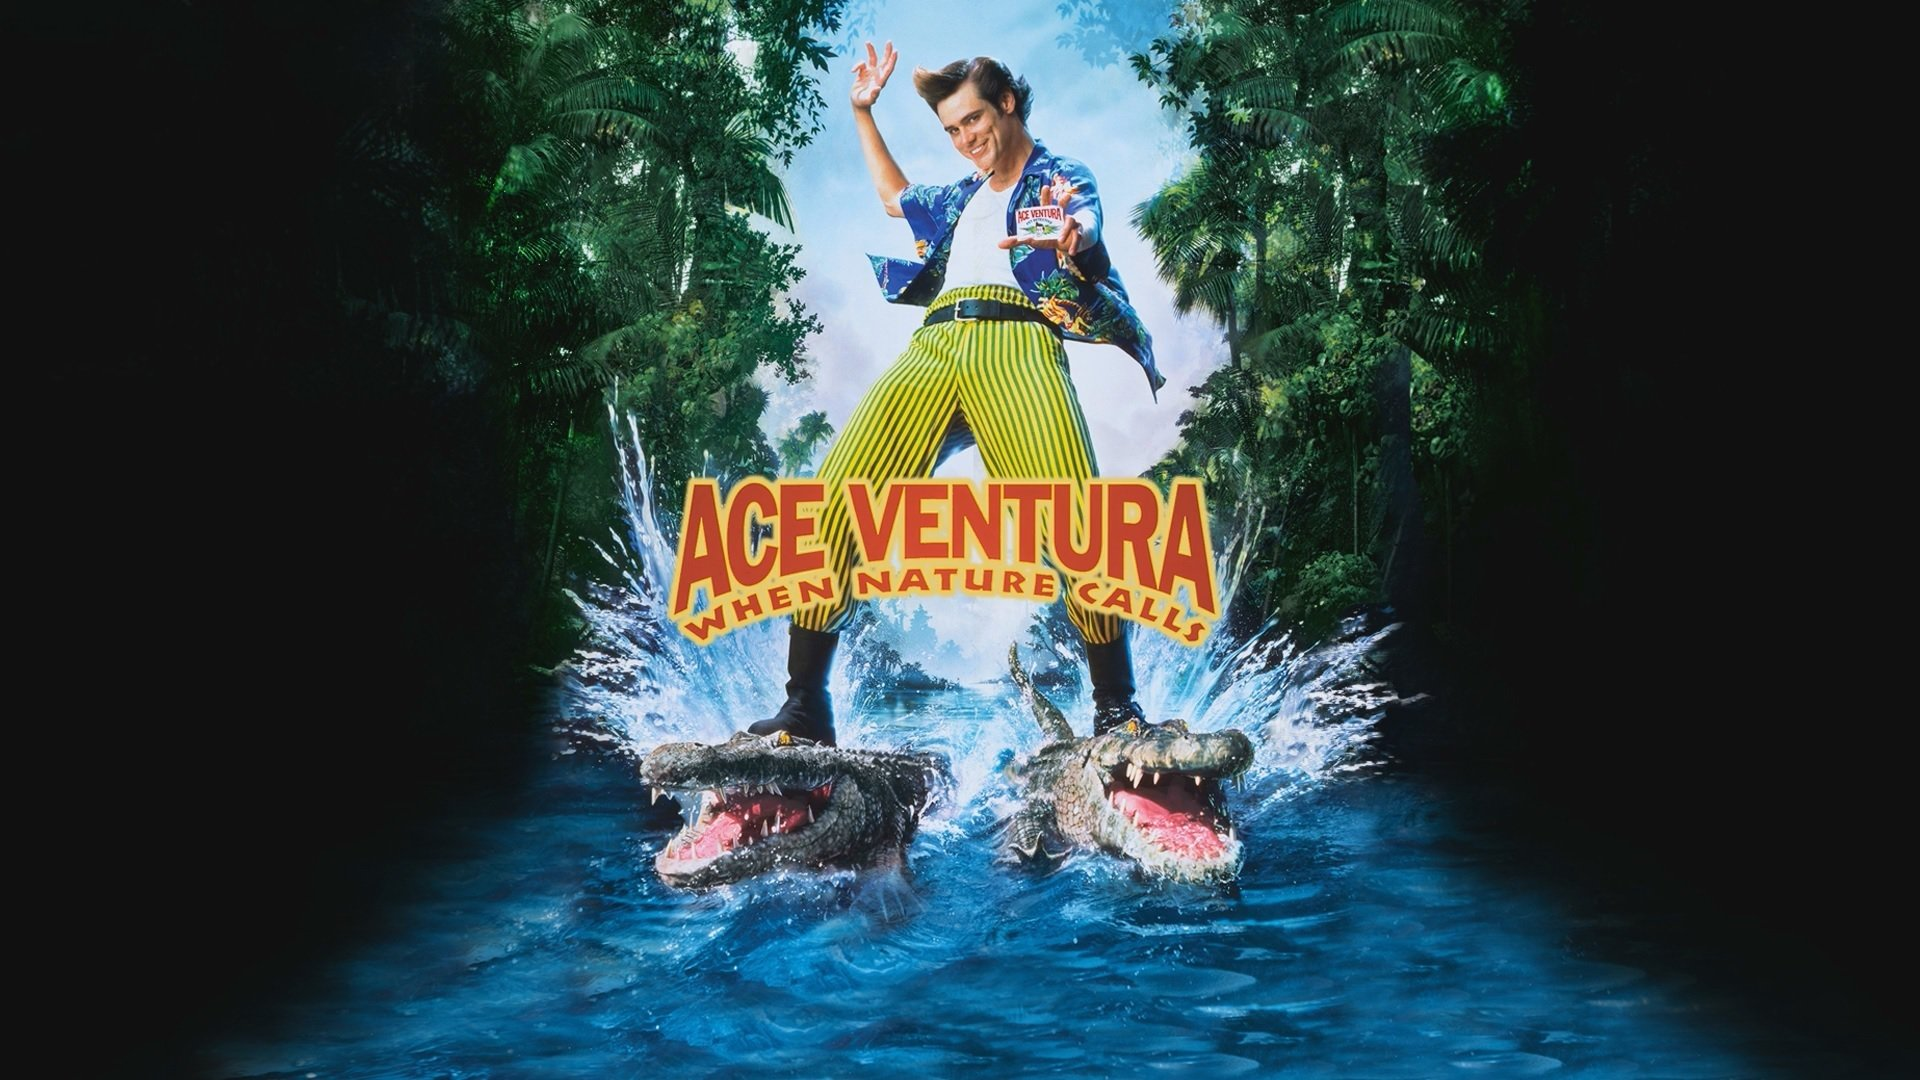 ace ventura when nature calls full movie download in tamil